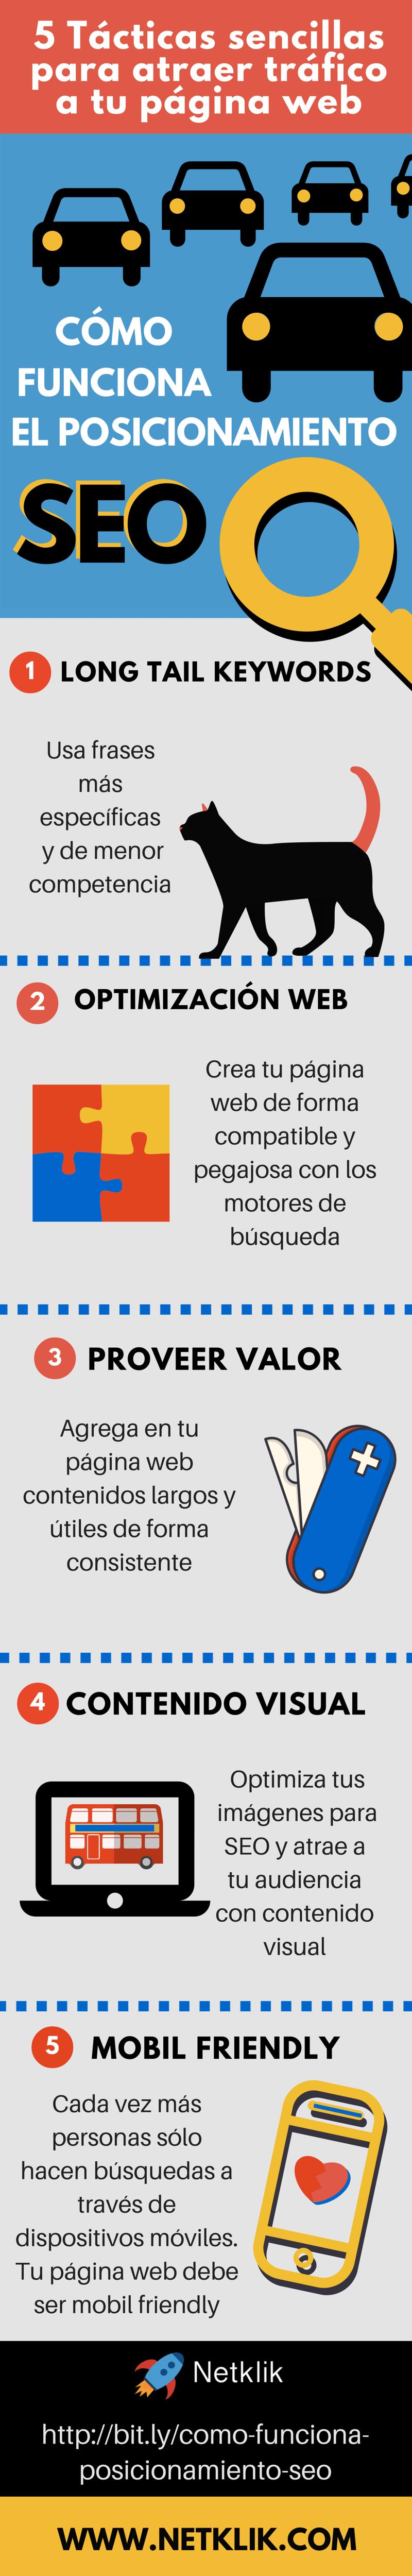 5 tácticas sencillas para atraer tráfico a tu web #infografia #infographic #seo